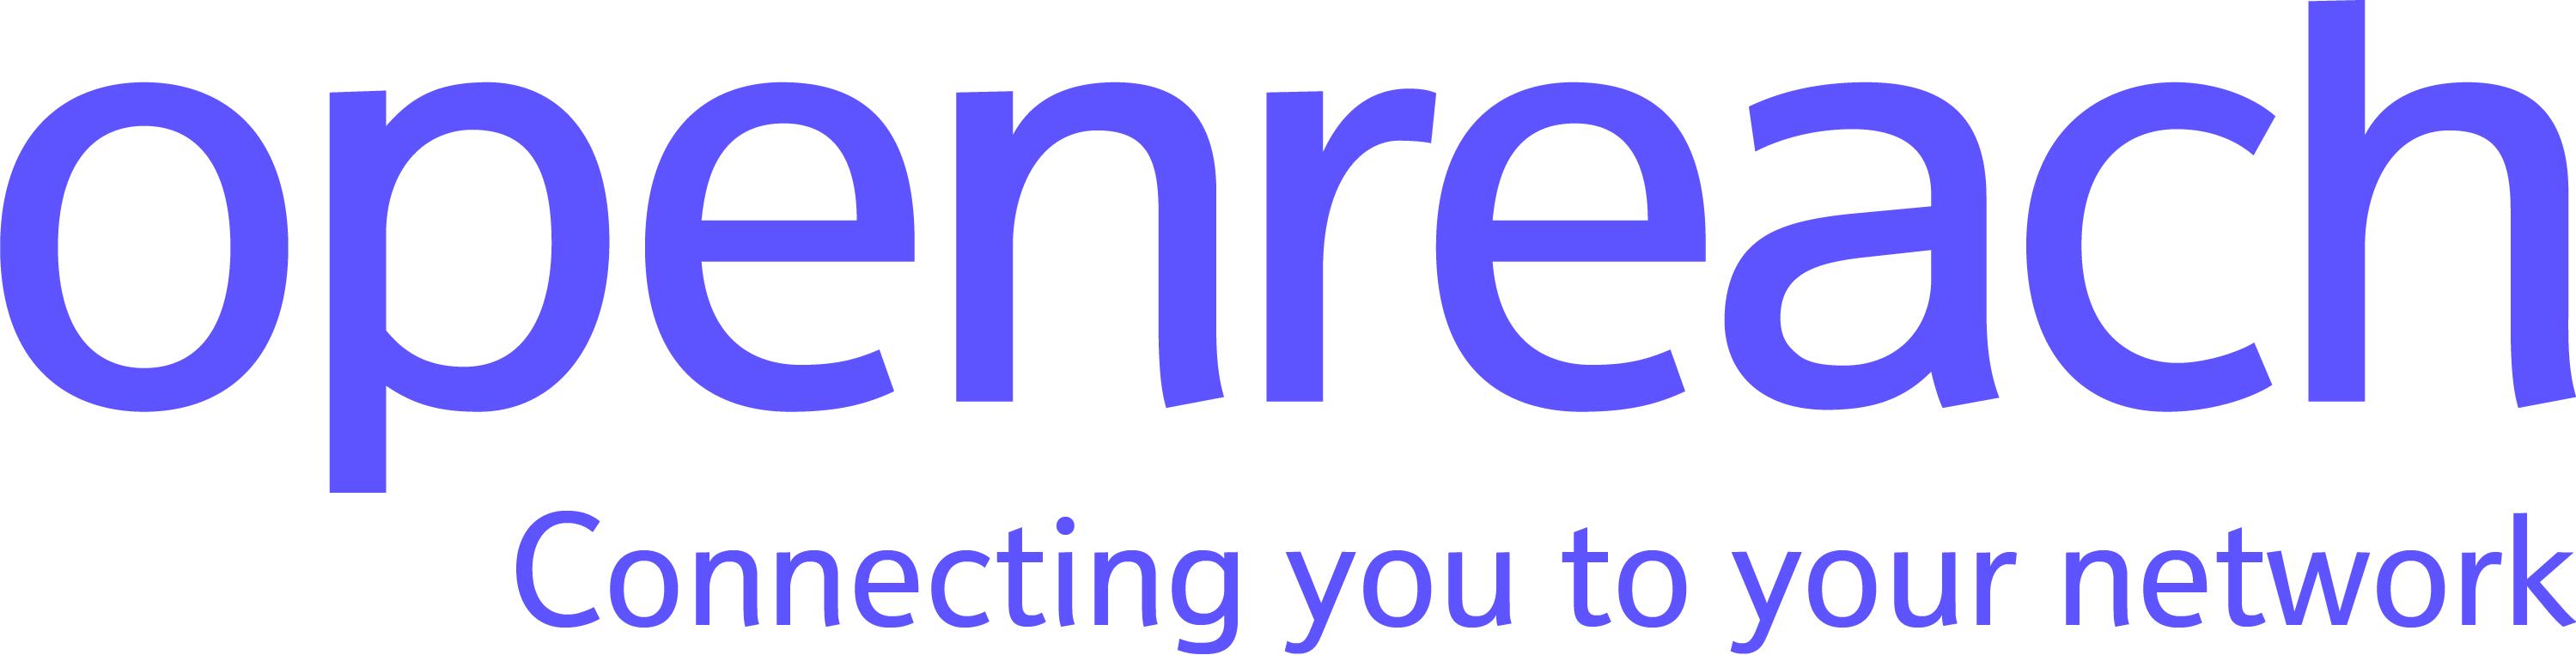 Openreach company logo